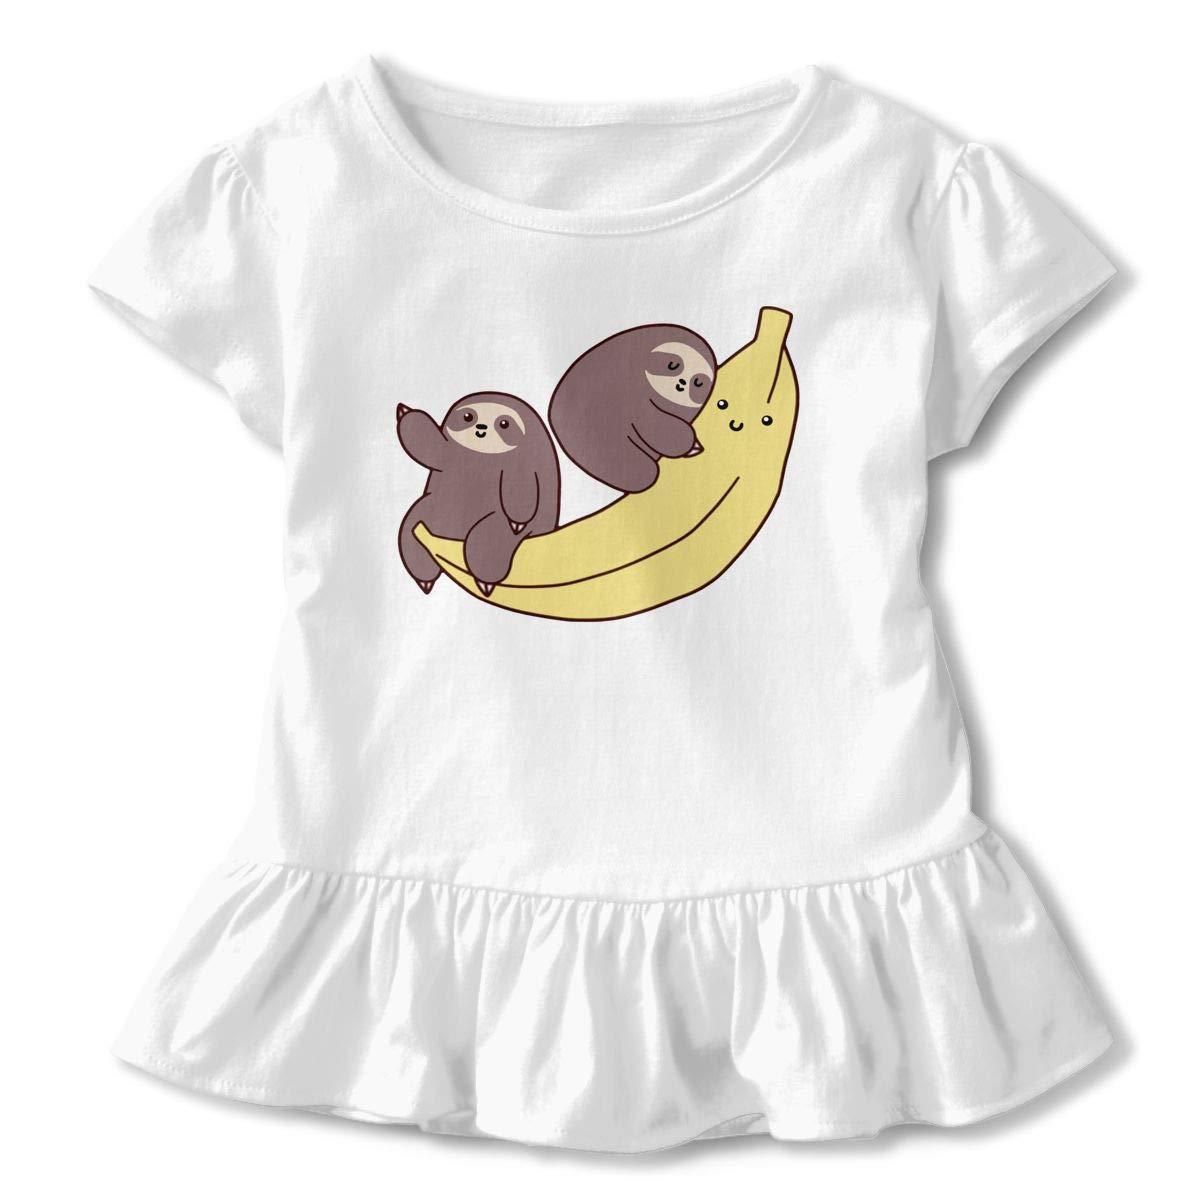 Sloths and Giant Banana Baby Girls Casual Ruffle Top T-Shirt Flounces Dress Toddler Girls Summer Tops